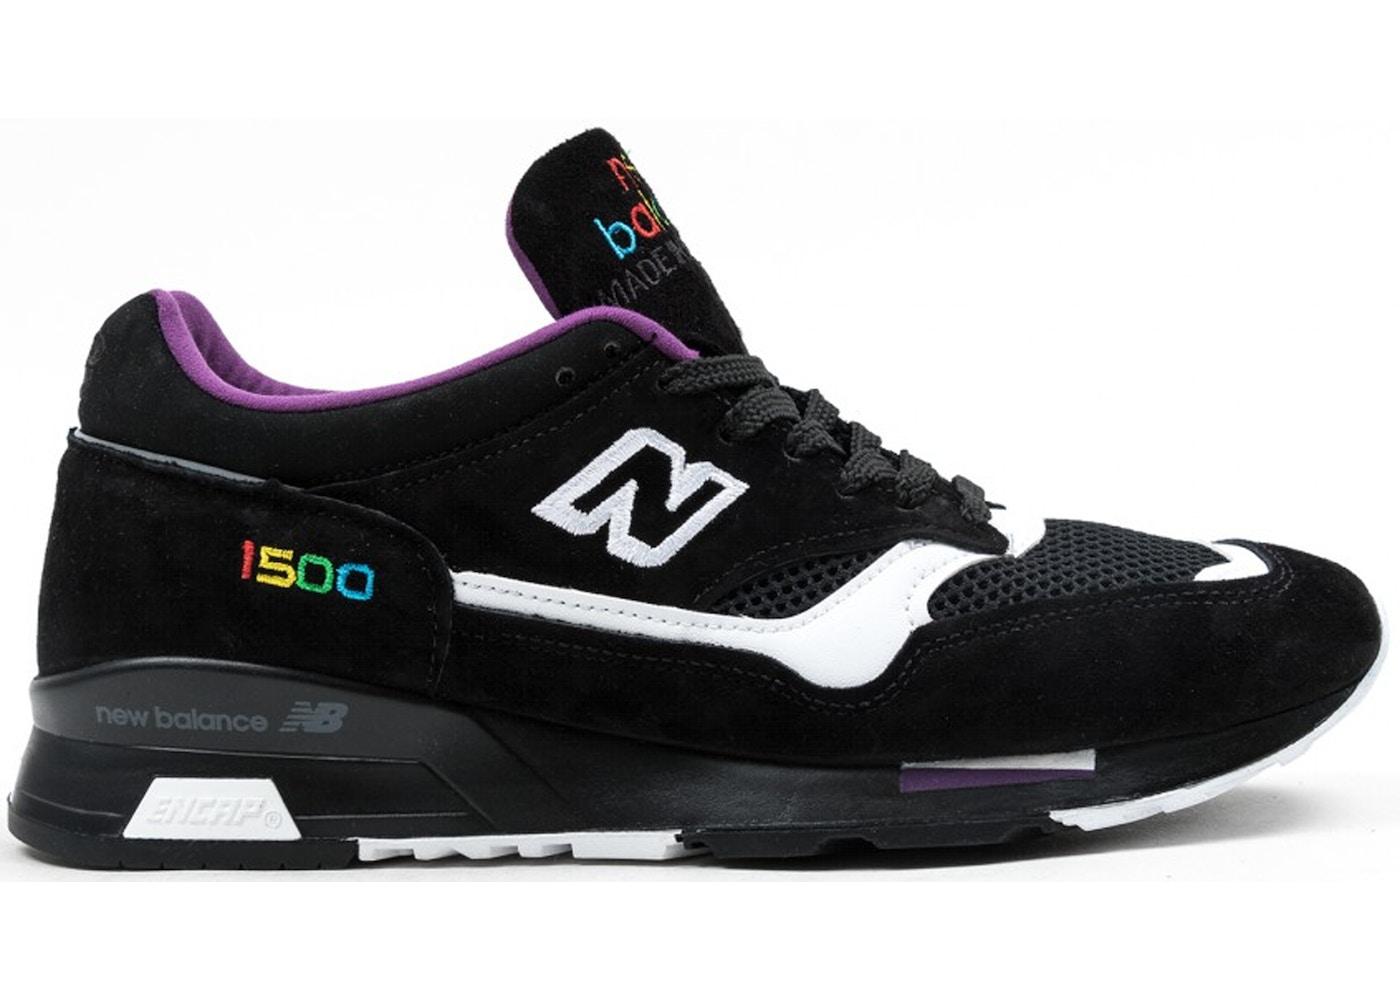 New Balance 1500 Prism Black